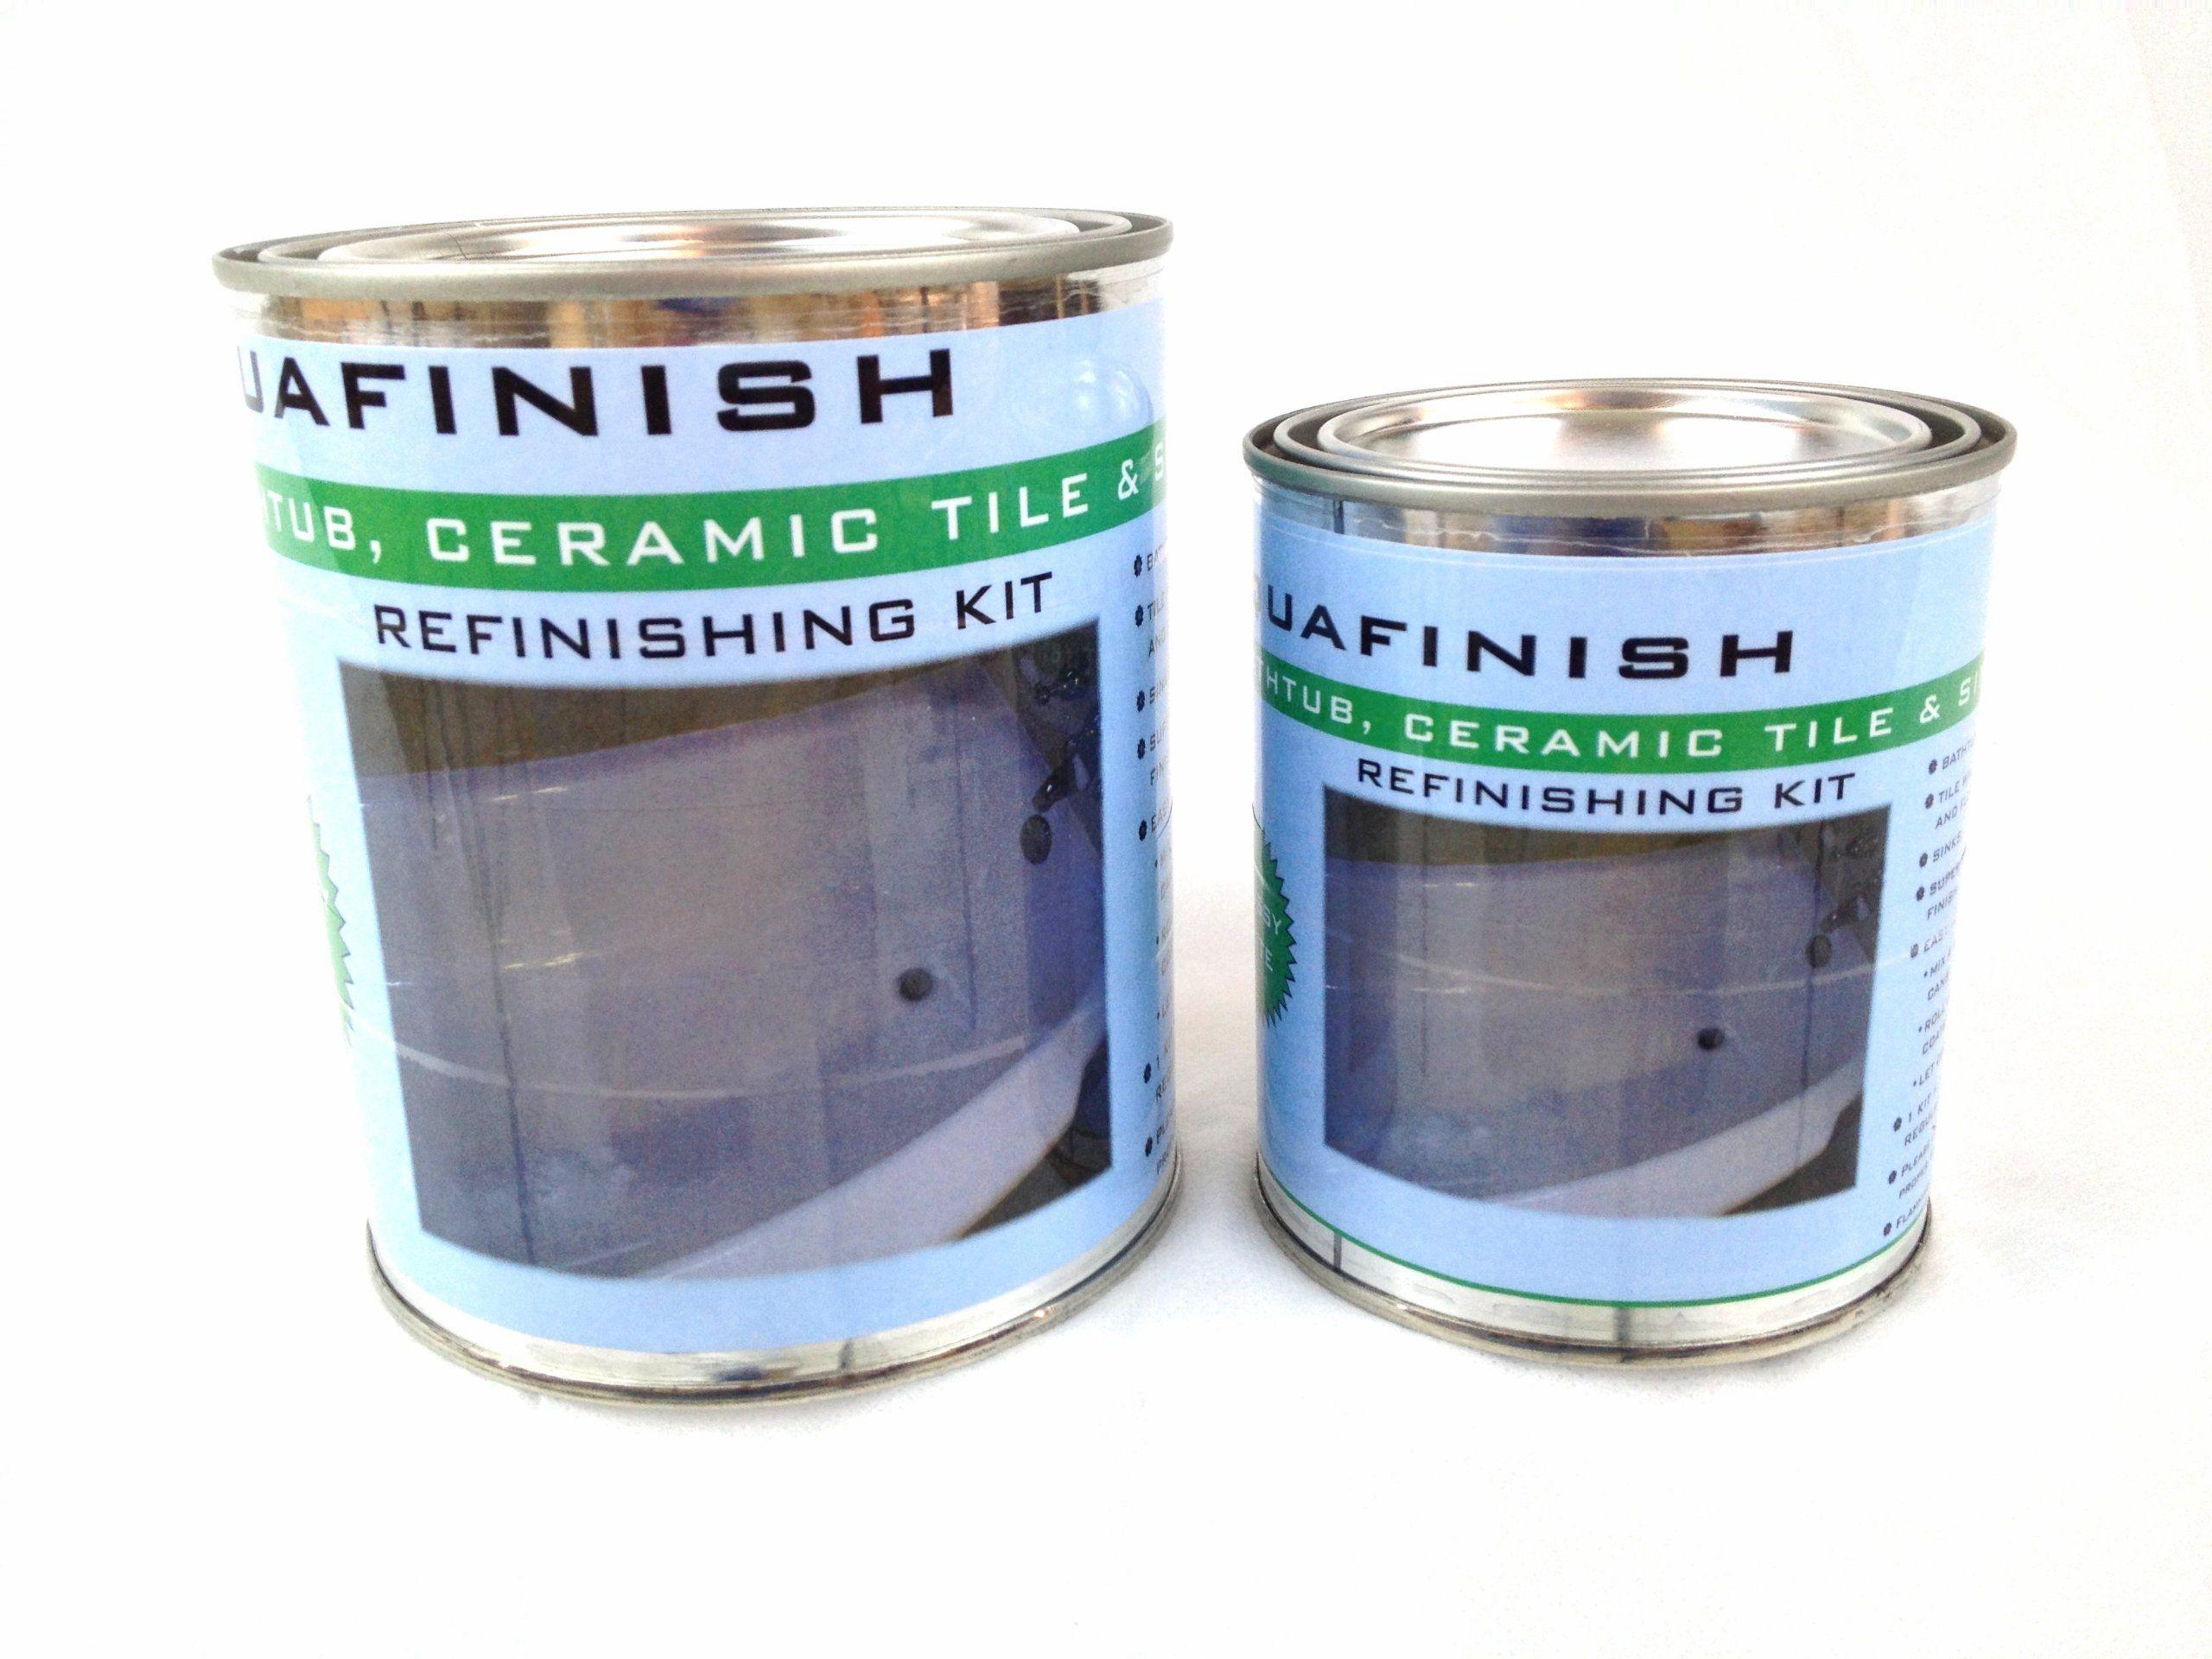 Aquafinish Bathtub Refinishing Kit Coating Only Bathtub